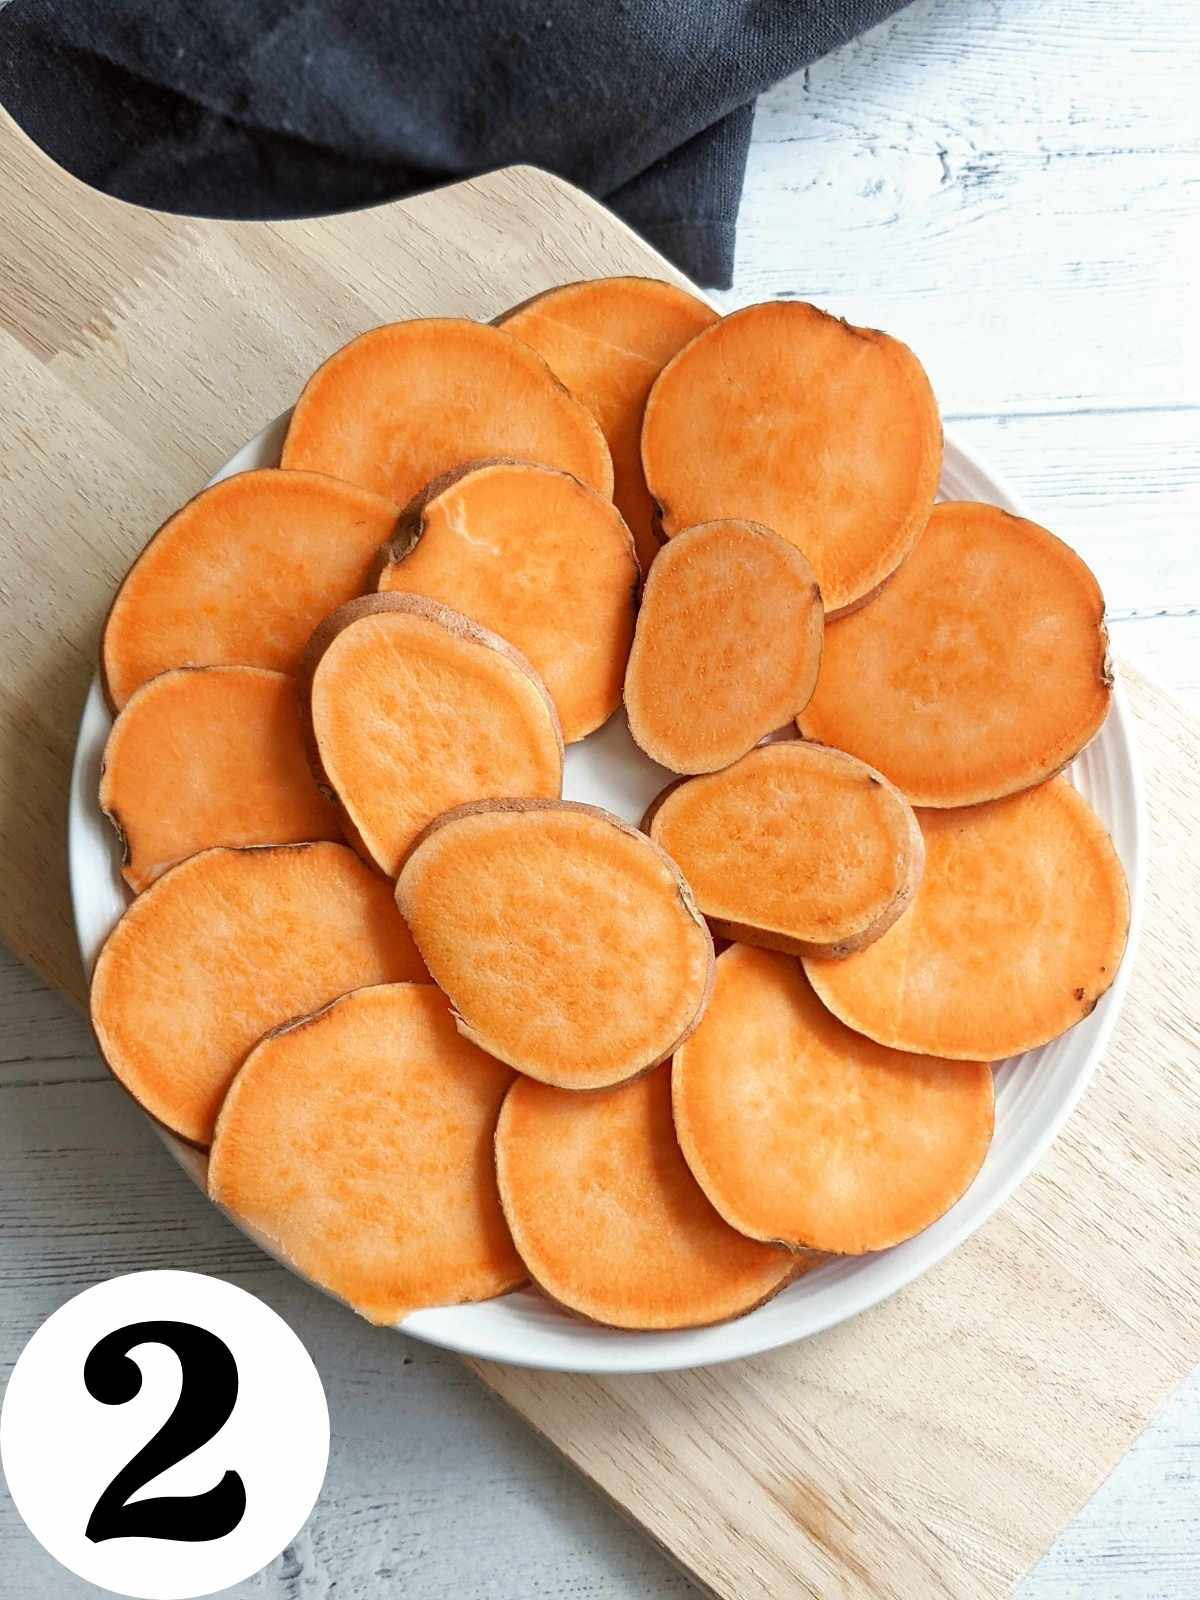 Sliced sweet potato arranged on a microwave-safe plate.